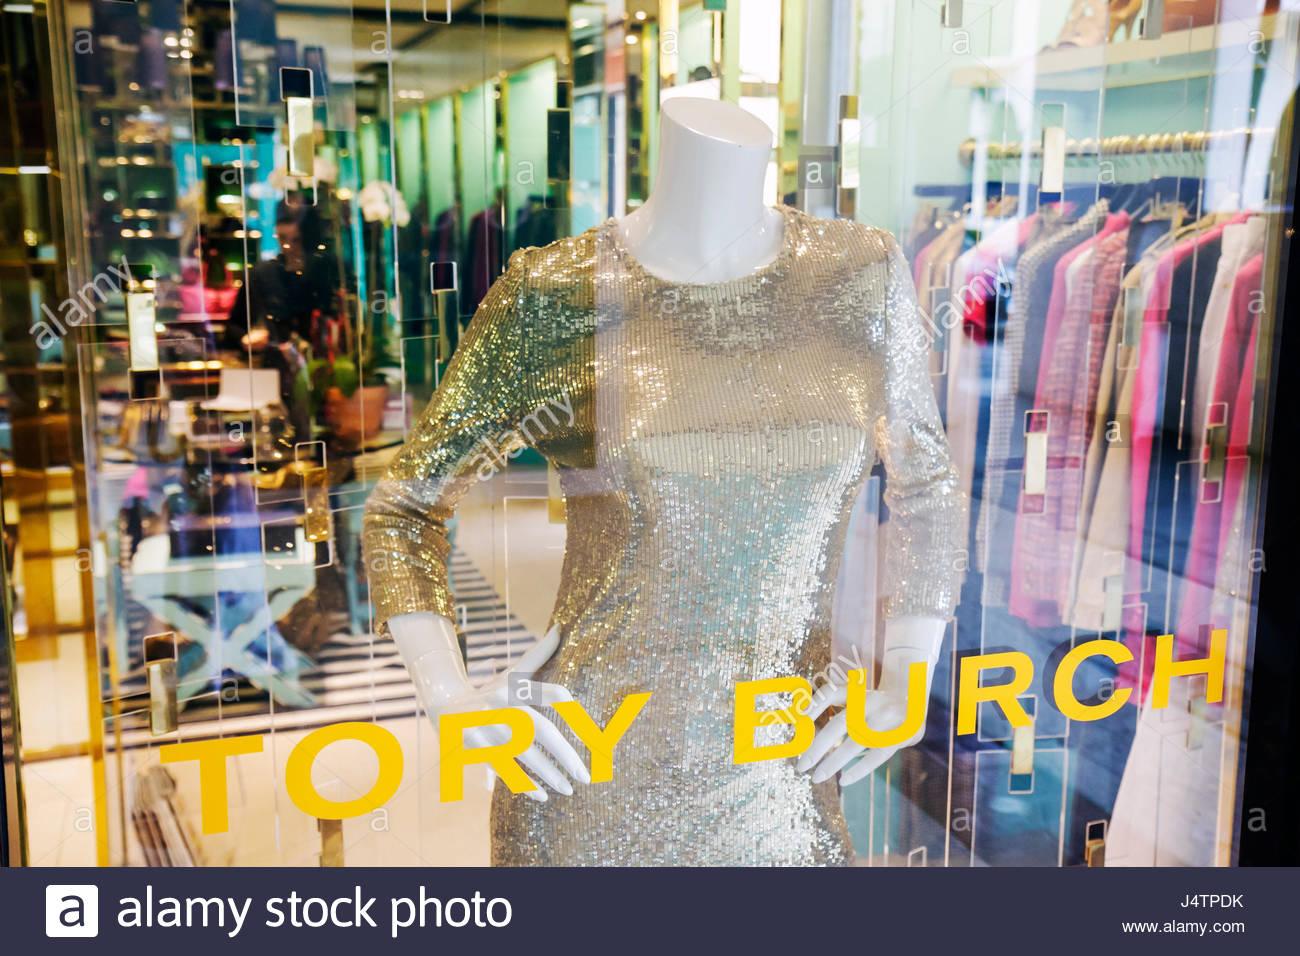 0fc4fe6543a4 Palm Beach Florida Worth Avenue Tory Burch boutique business store window  fashion designer upscale luxury high-end shopping reta